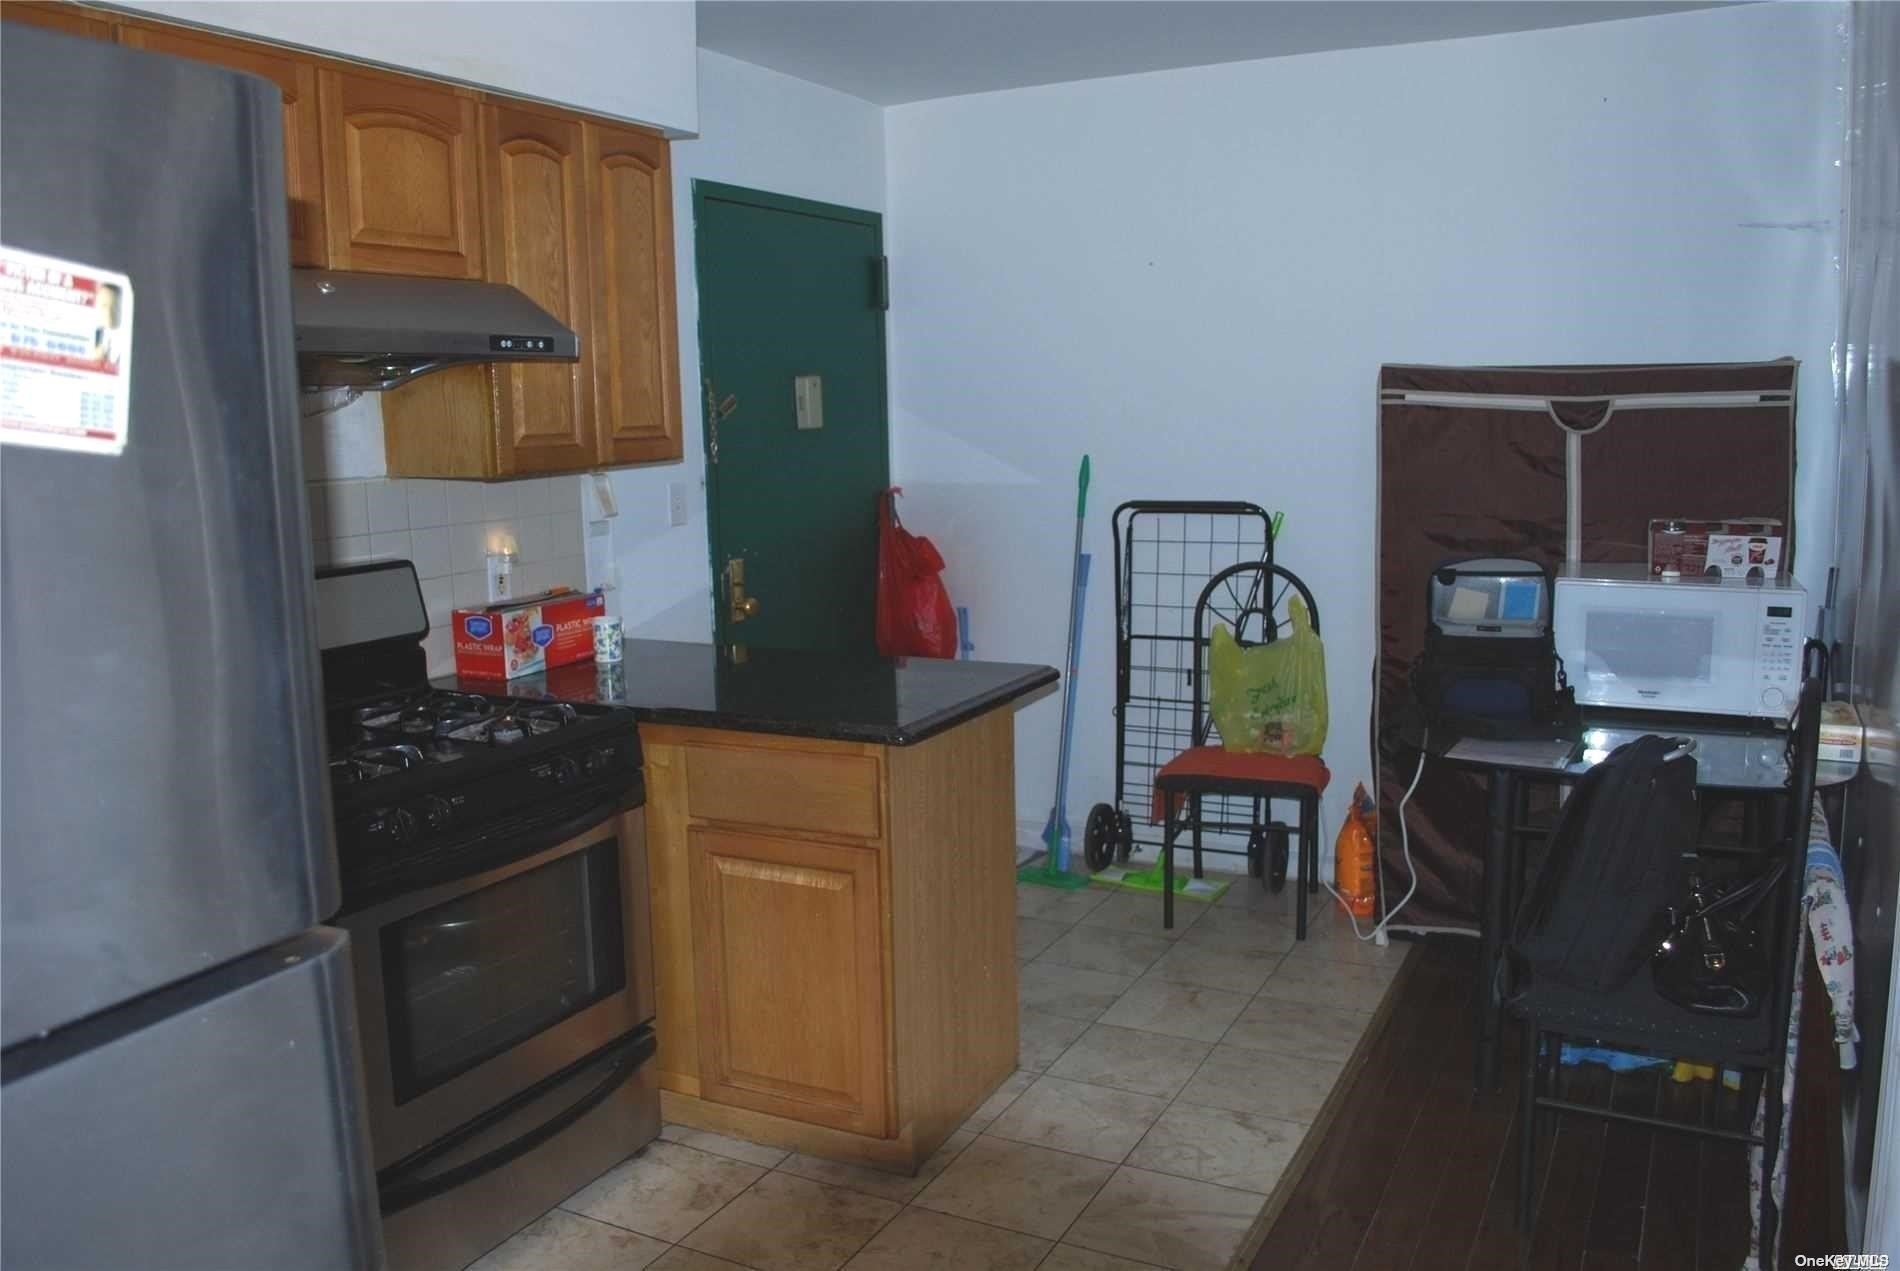 42-11 Parsons Boulevard #1B, Flushing, NY 11355 - MLS#: 3232848